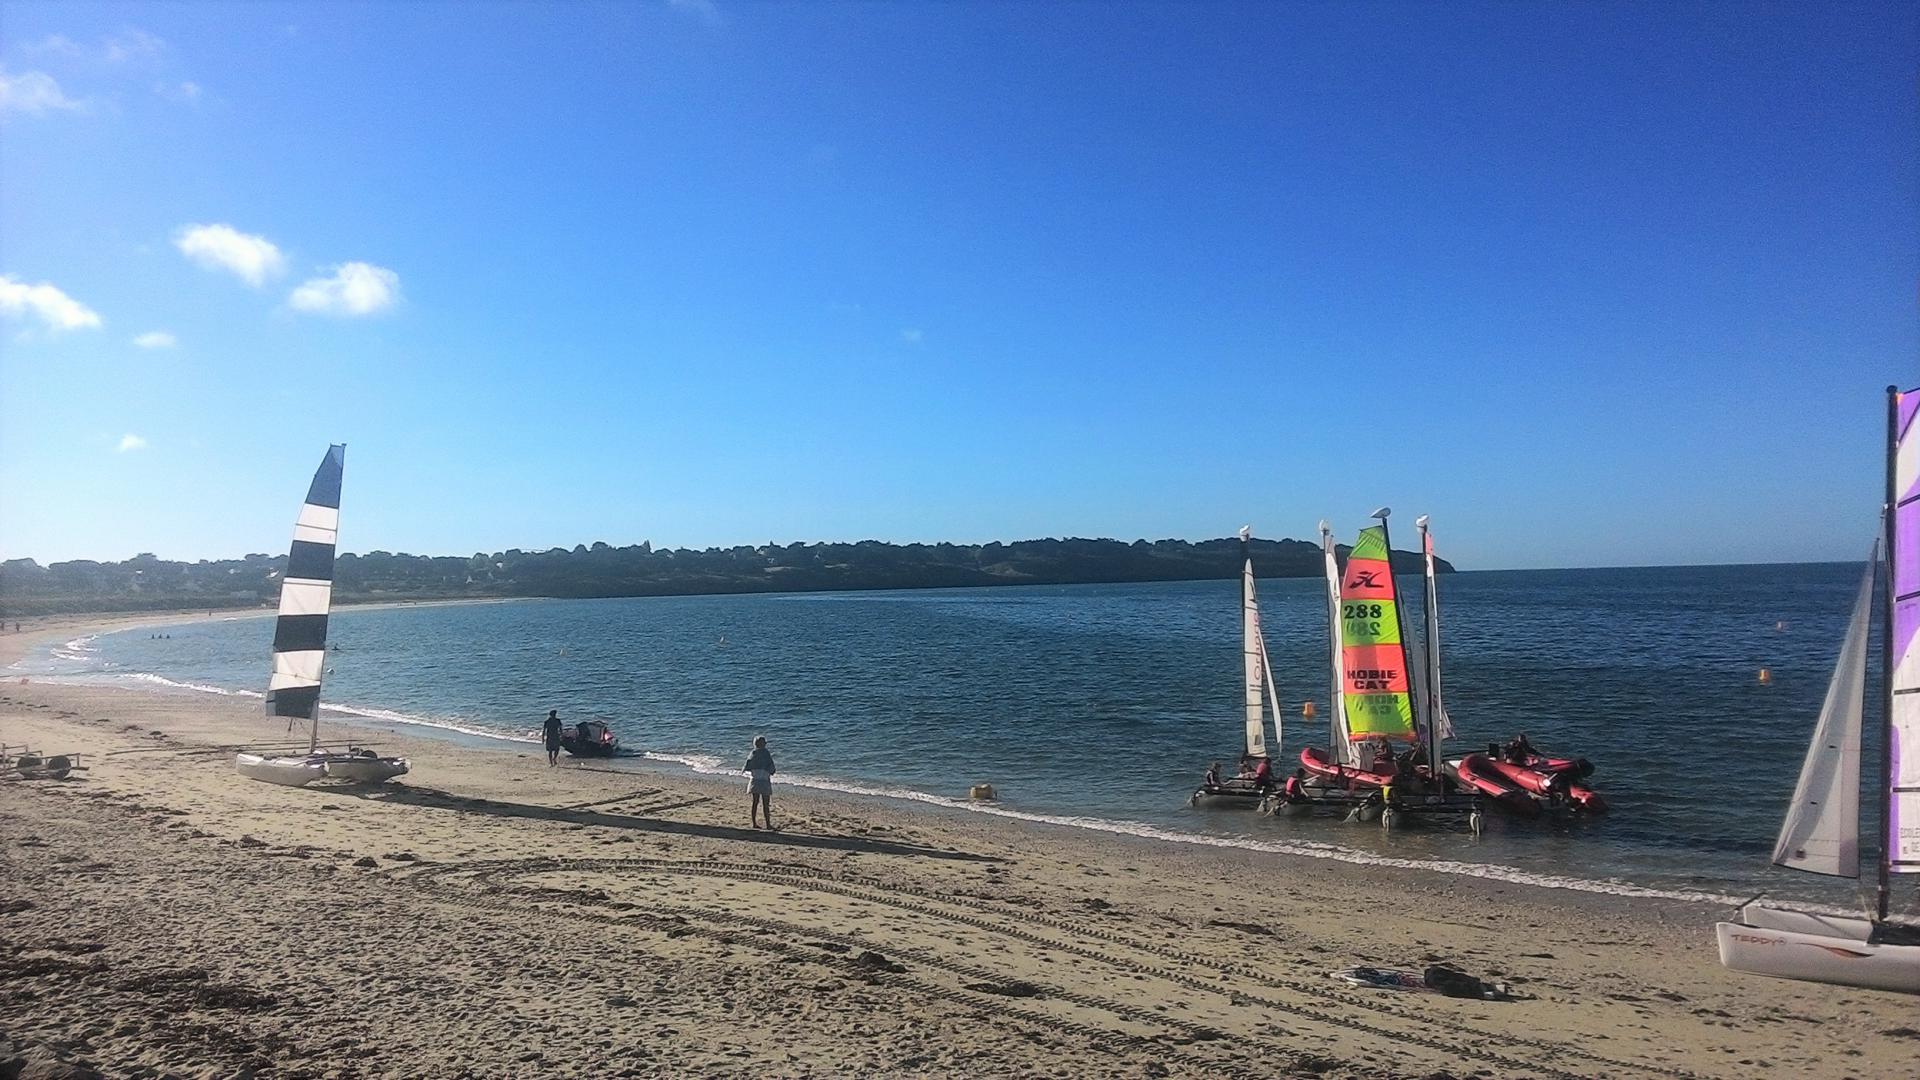 Club Nautique du Rohu - the best sandy beach